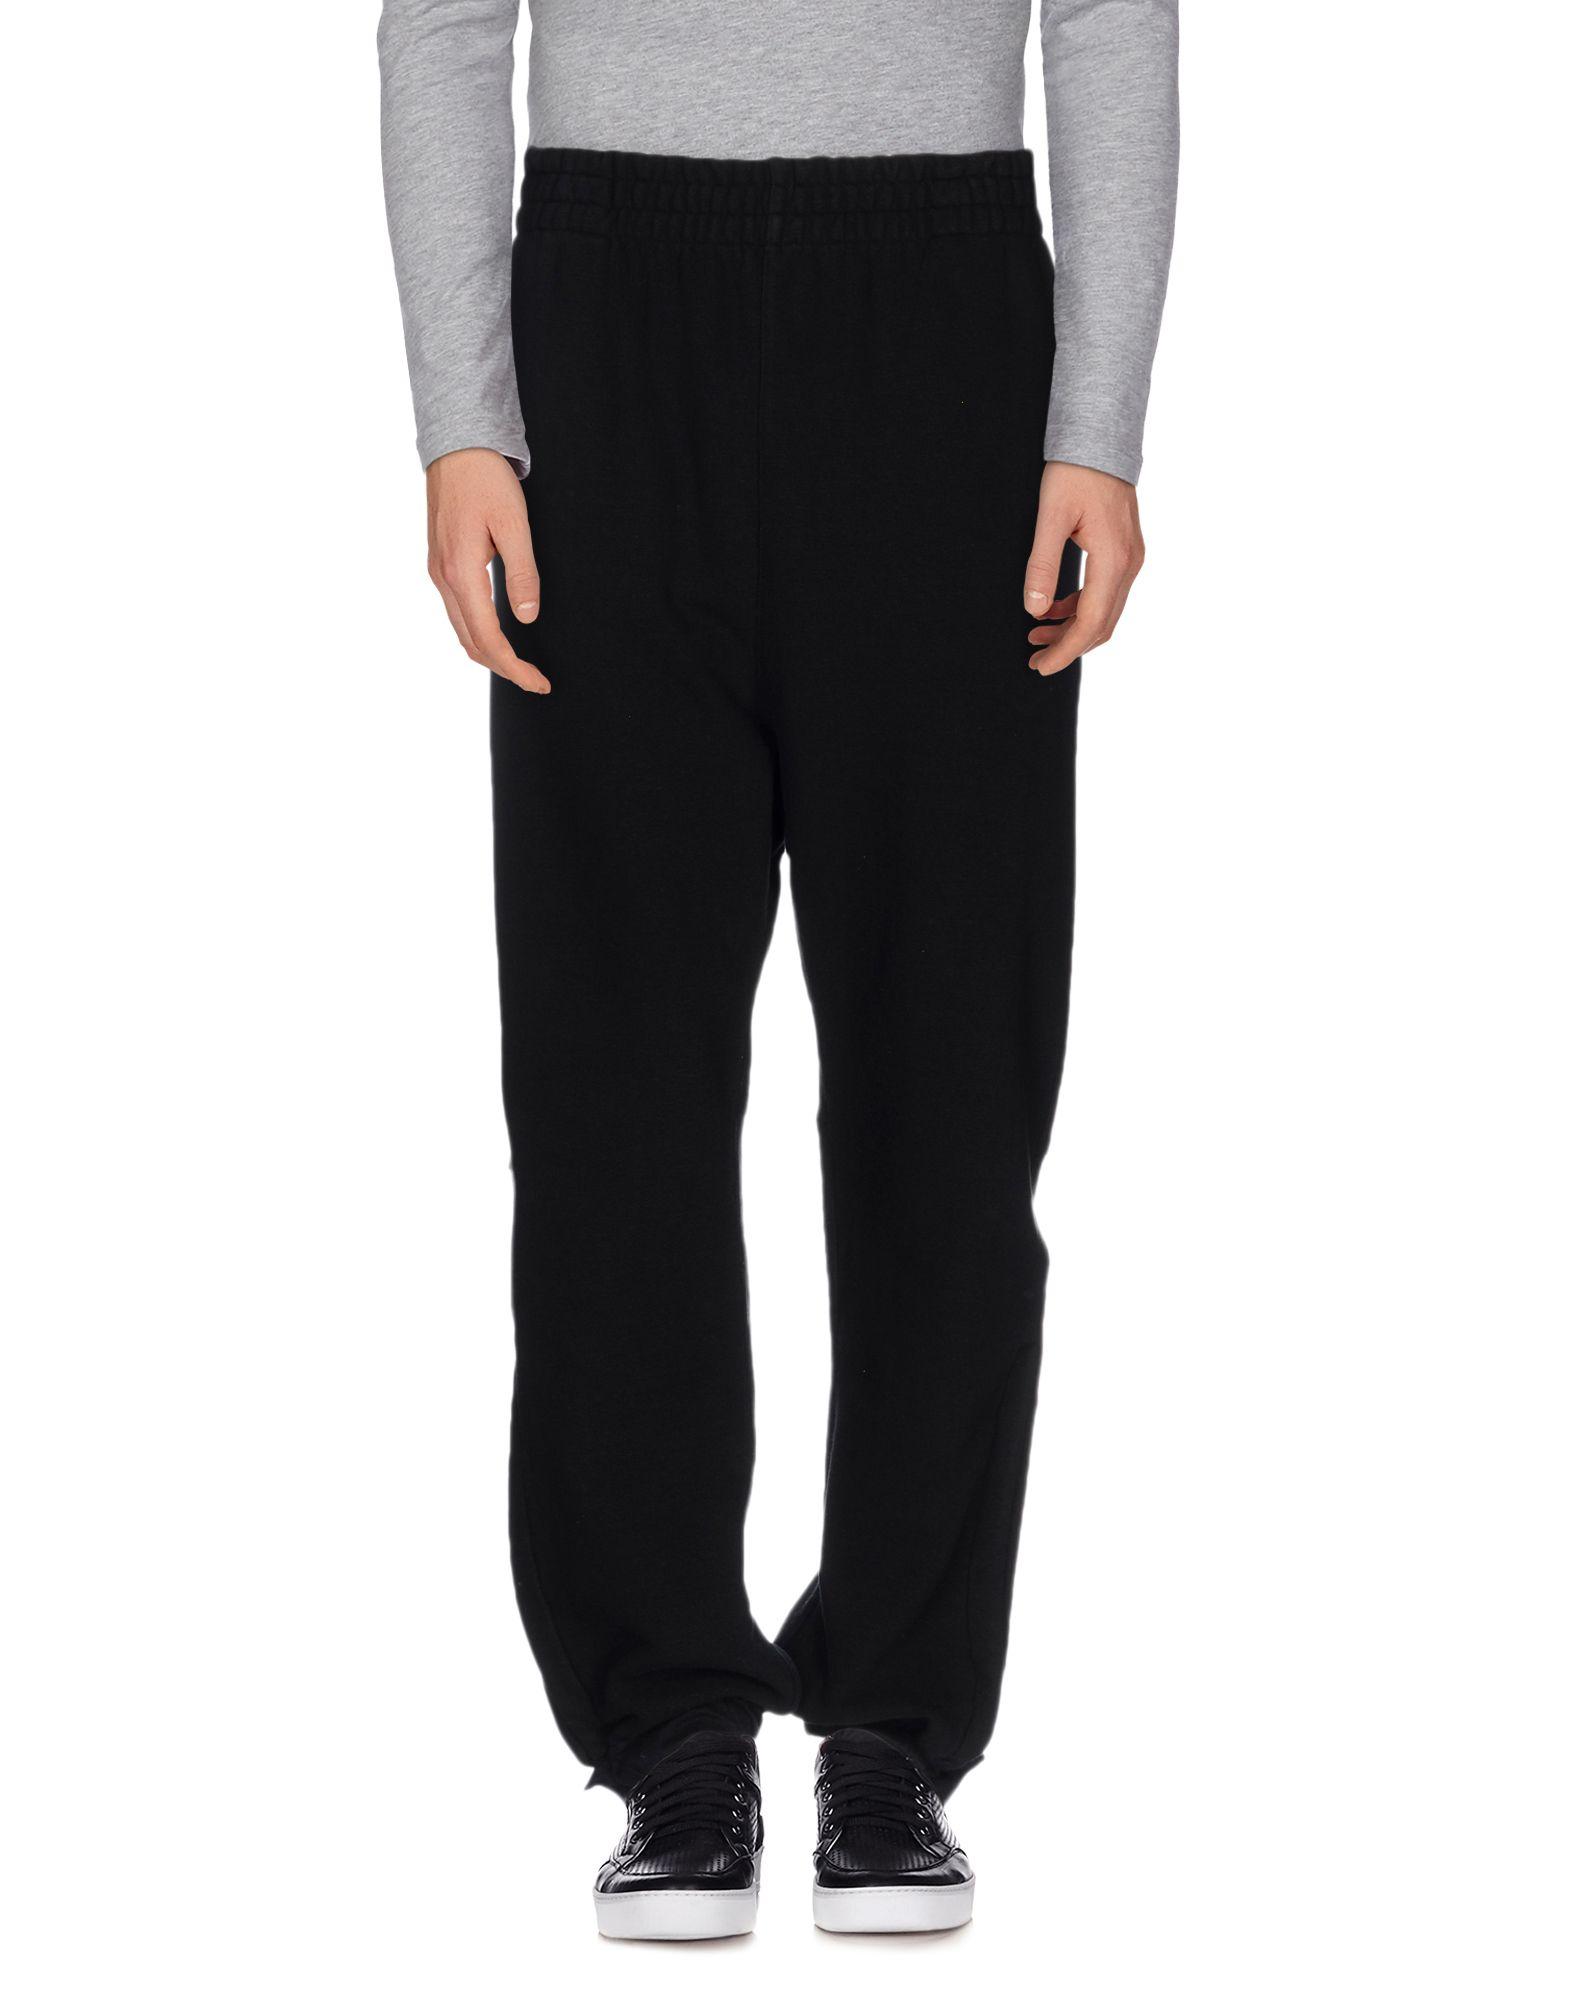 20770cb00ed73 Yeezy Casual Pants - Men Yeezy Casual Pants online on YOOX United ...